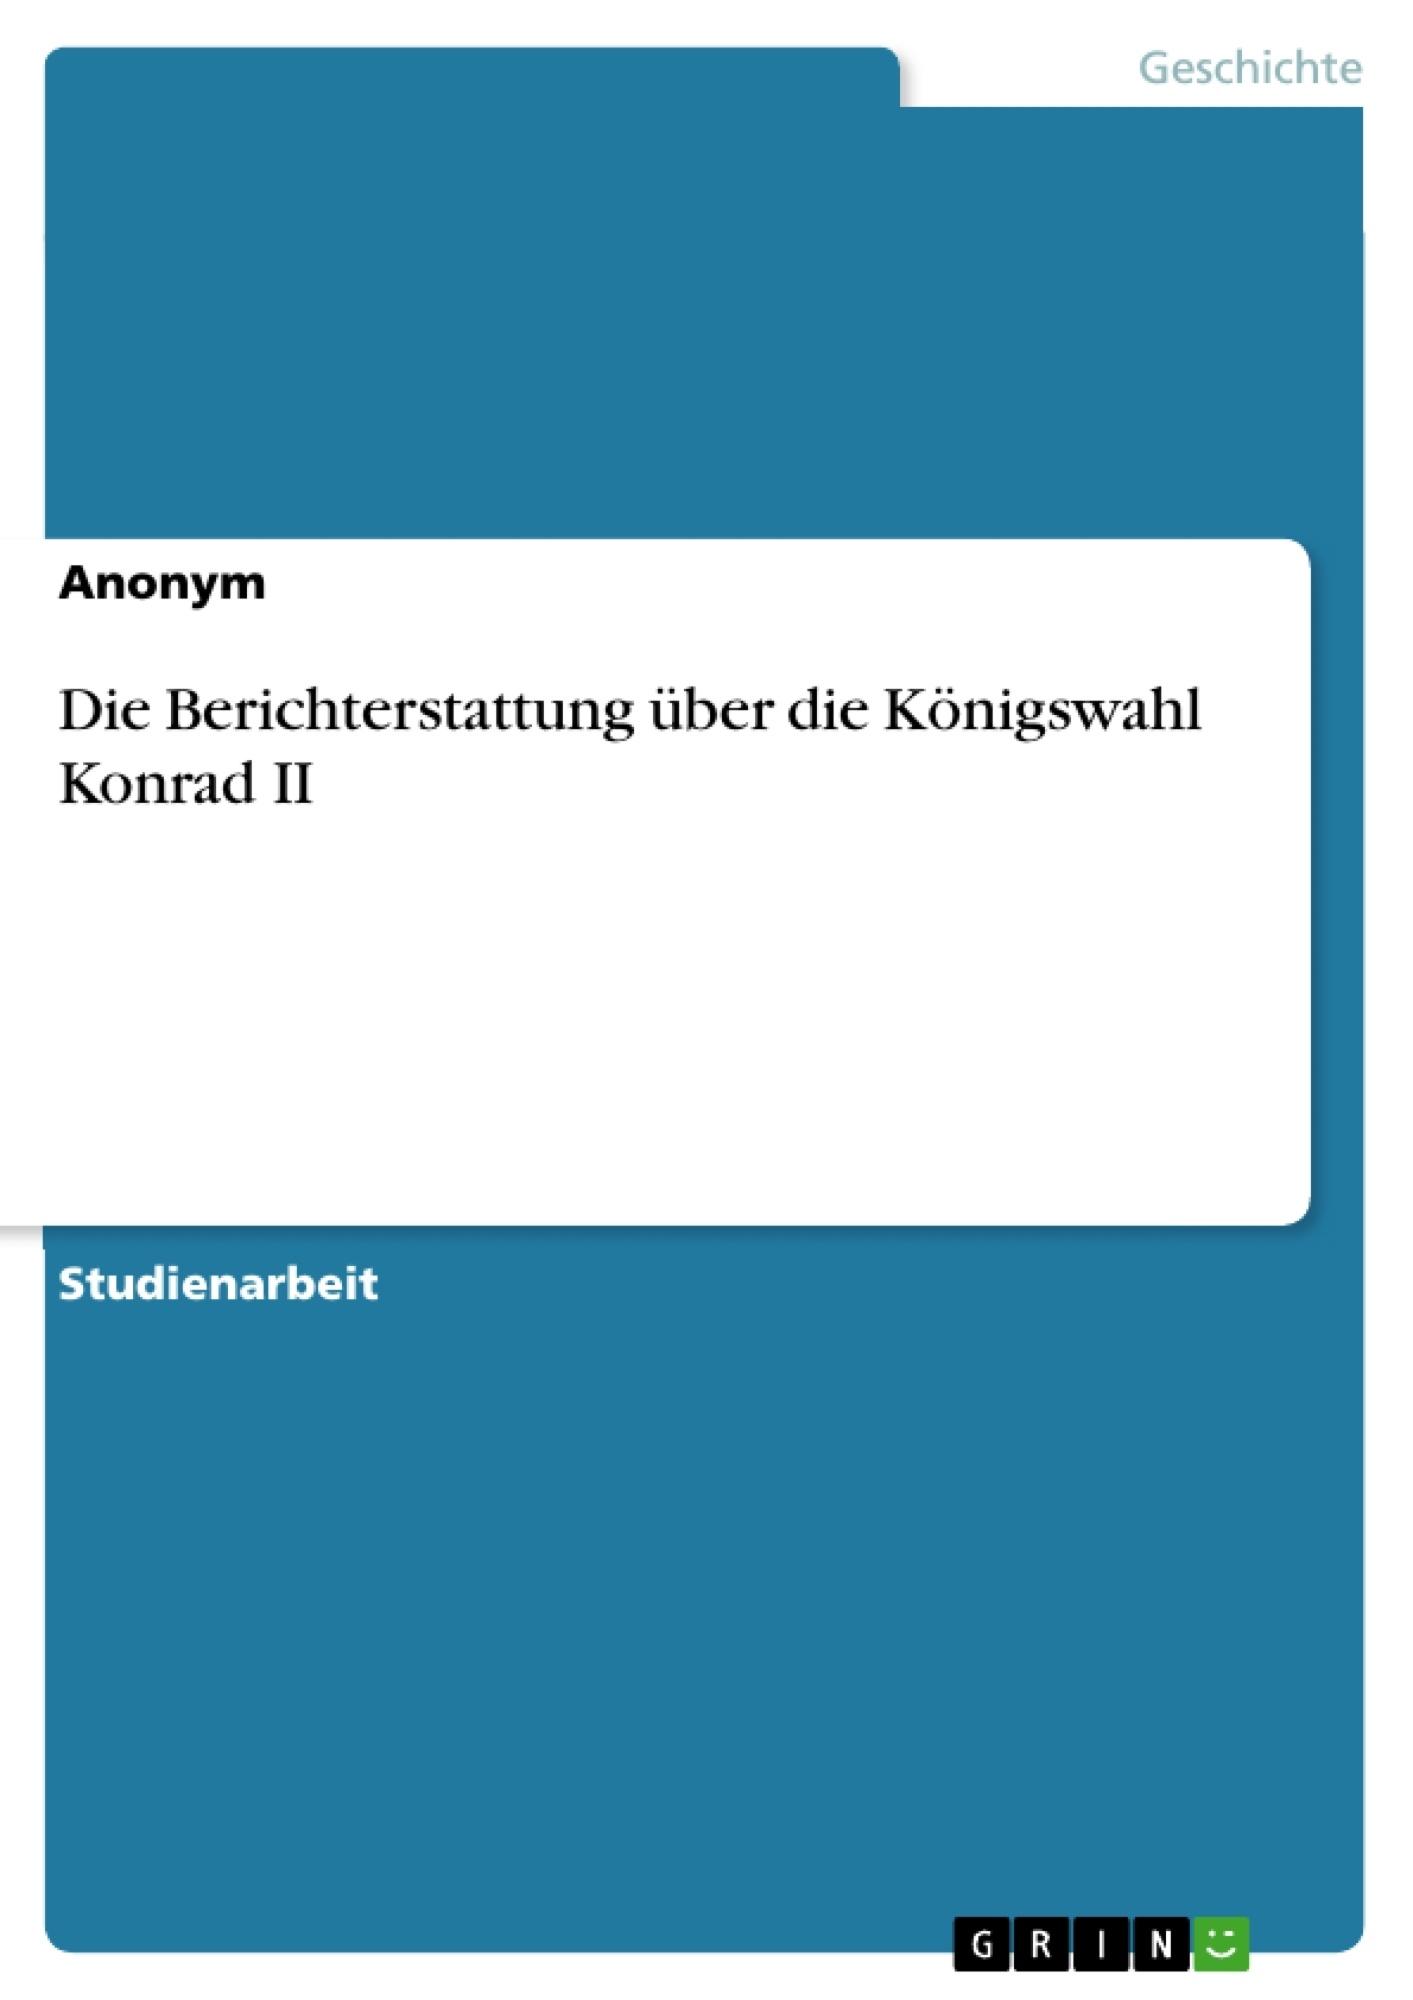 Titel: Die Berichterstattung über die Königswahl Konrad II